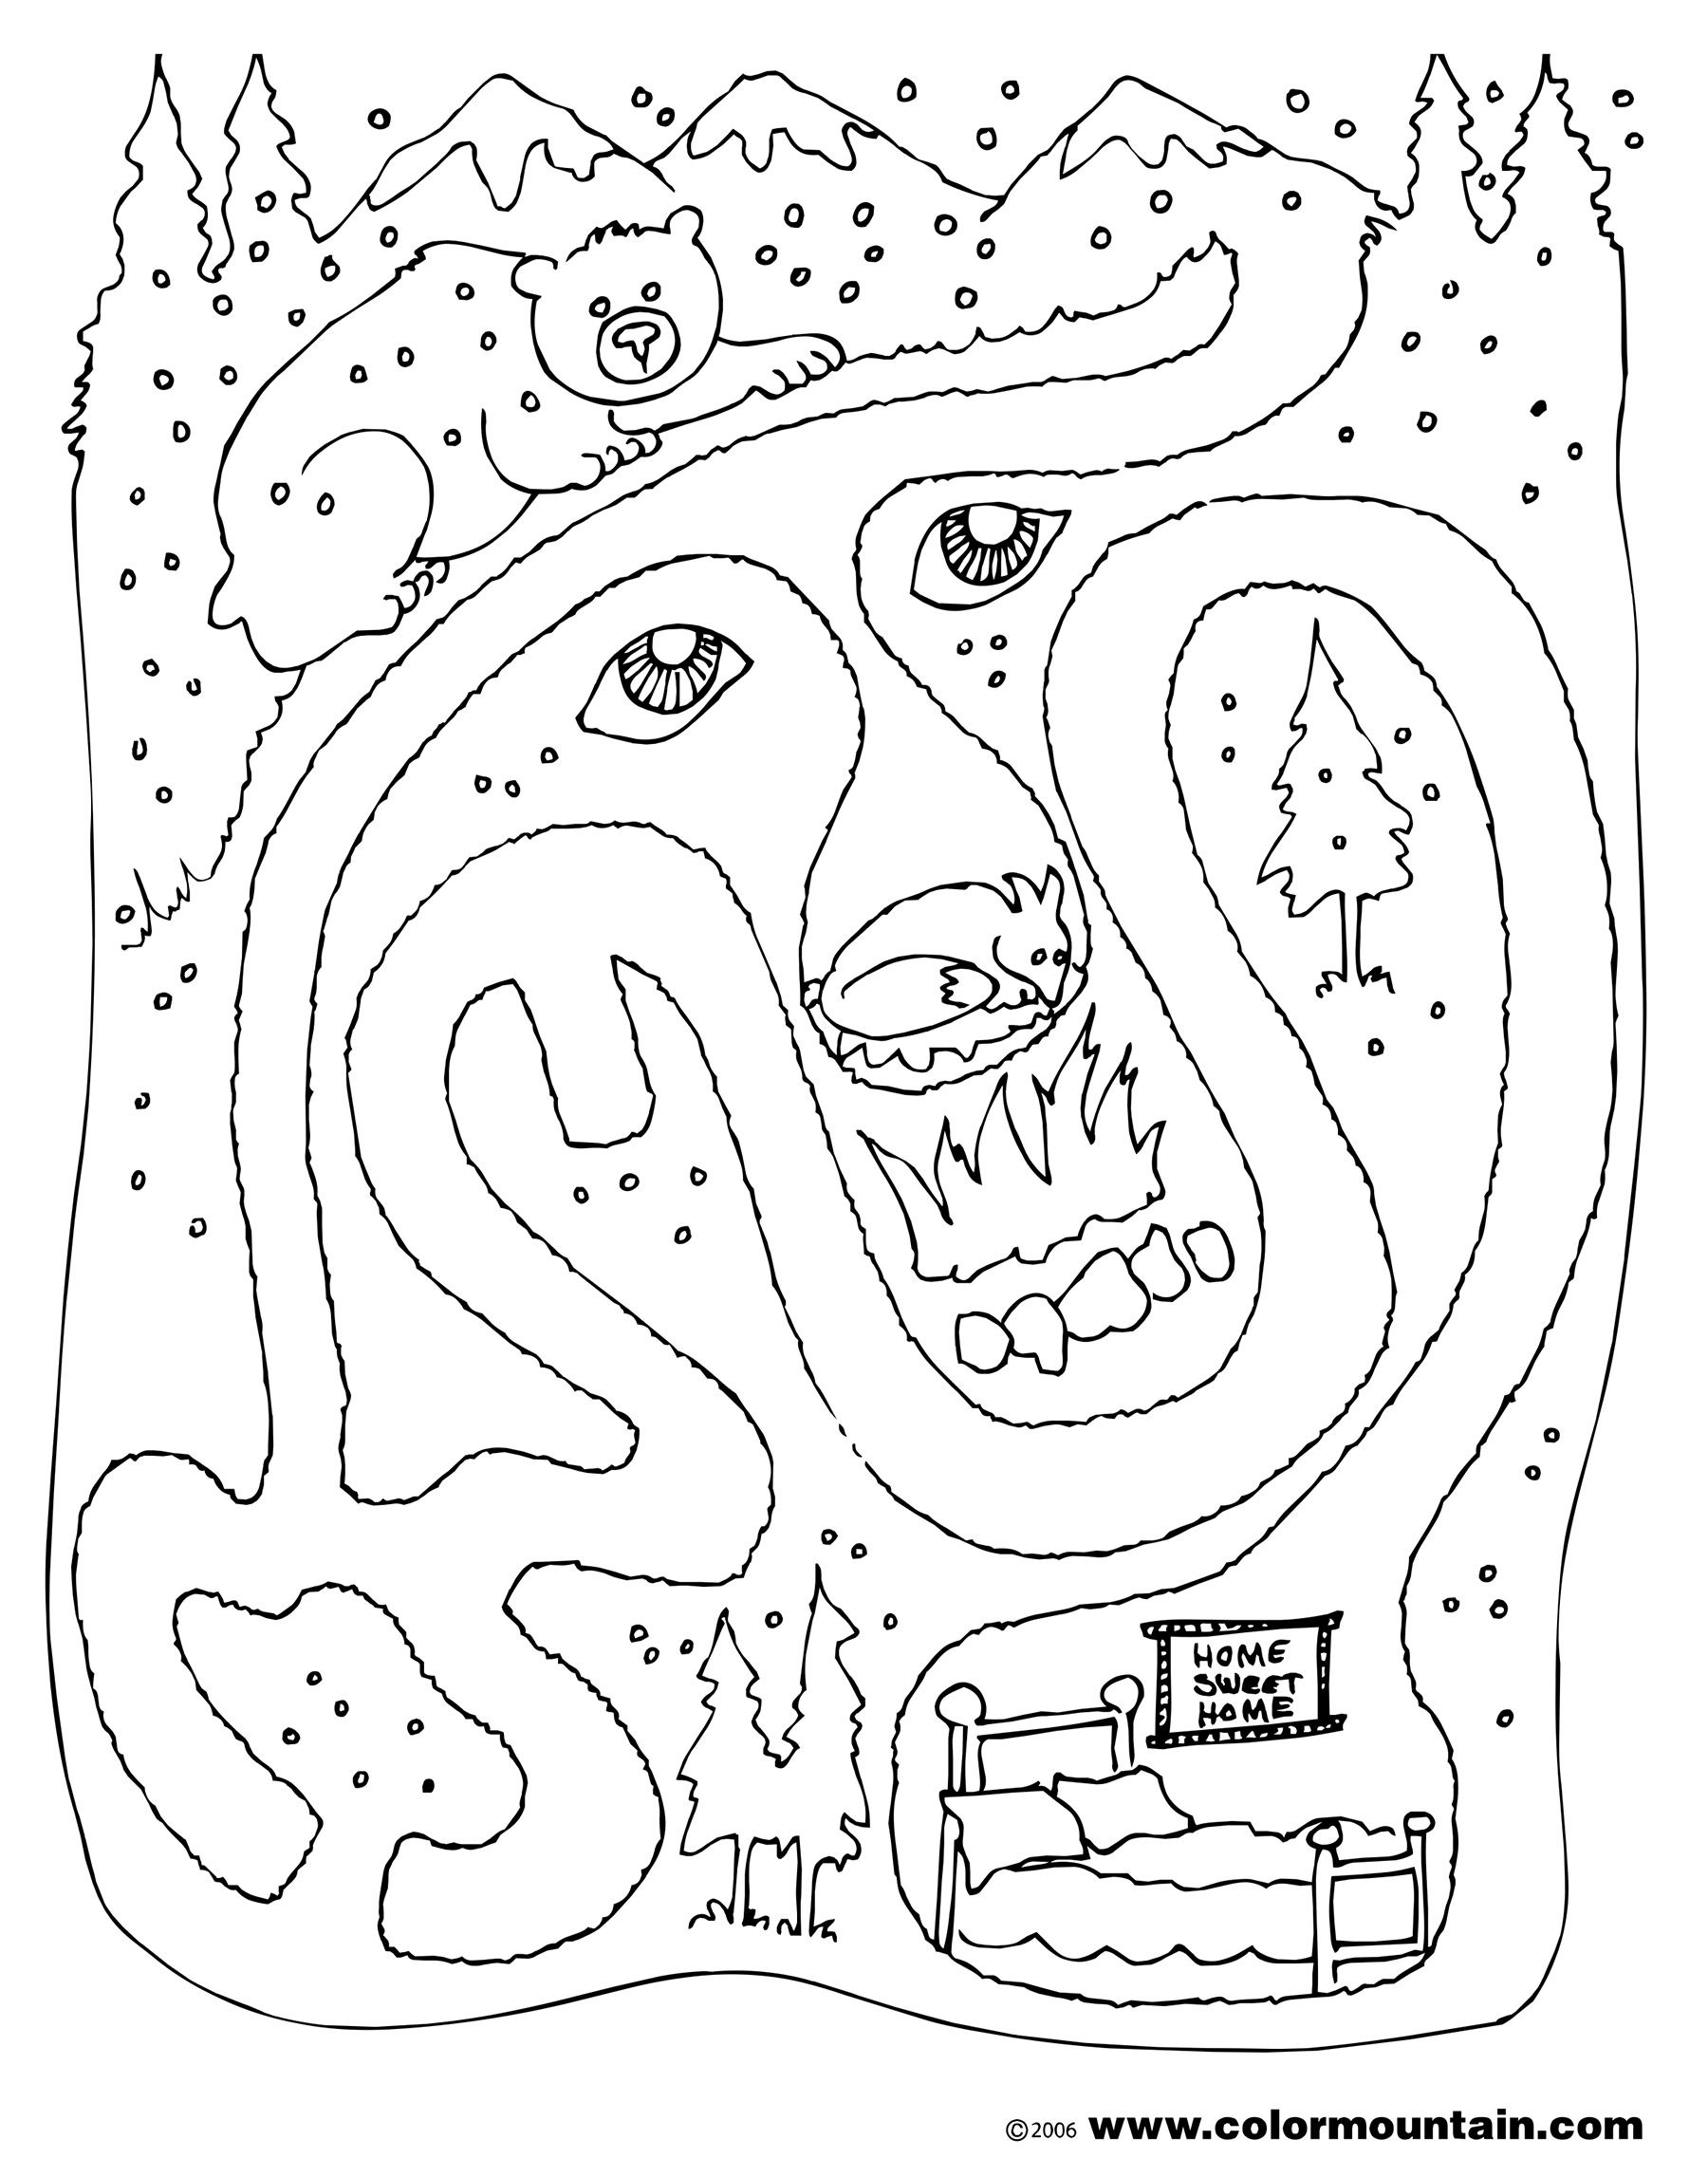 Free printable coloring pages hibernating animals - Coloring Pages Hibernating Animals Coloring Pages Hibernating Animals Coloring Pages Eassume Com Eassume